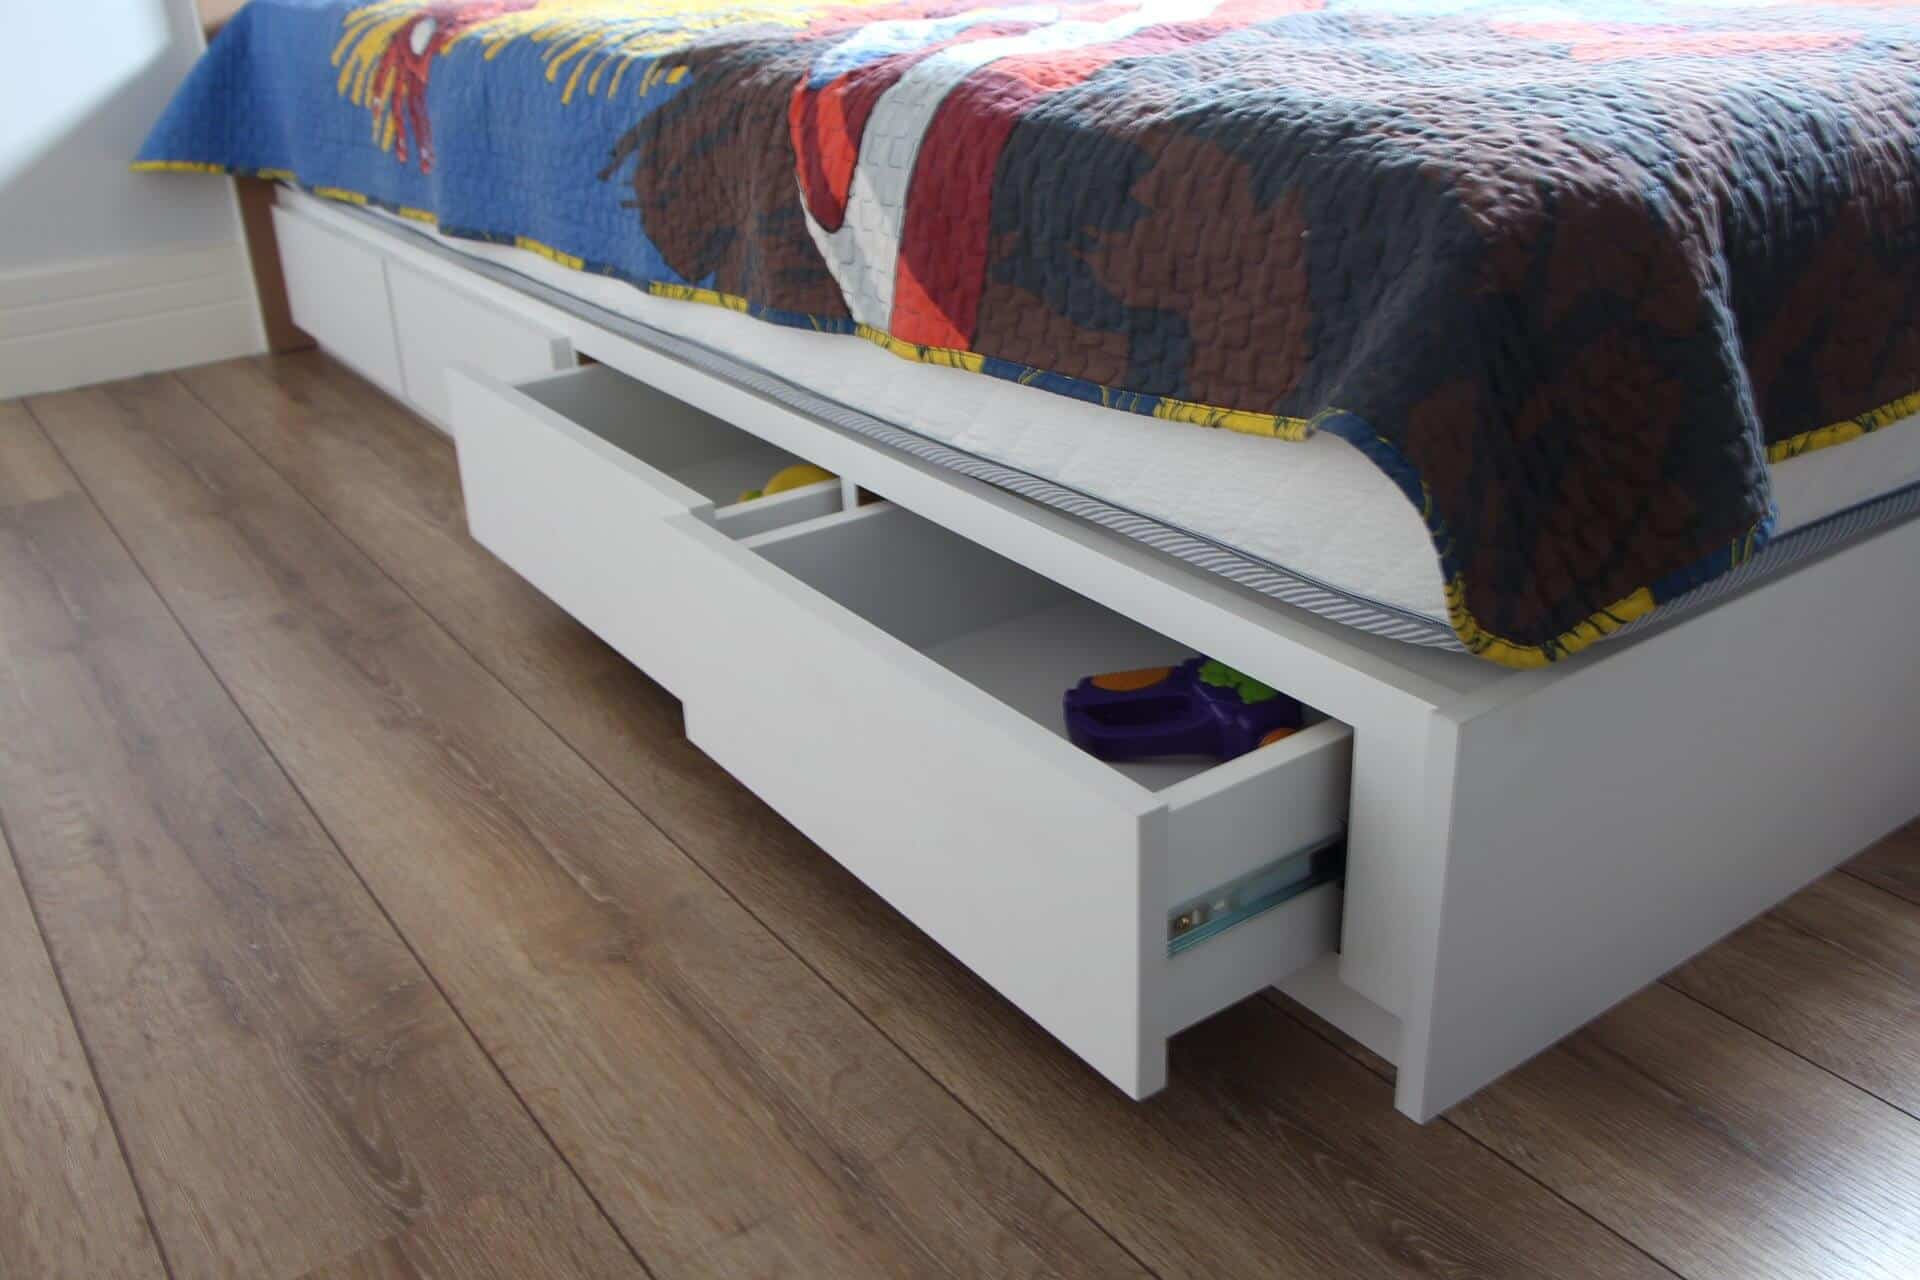 dormitorio-planejado_moveis-sob-medida-galeria-95